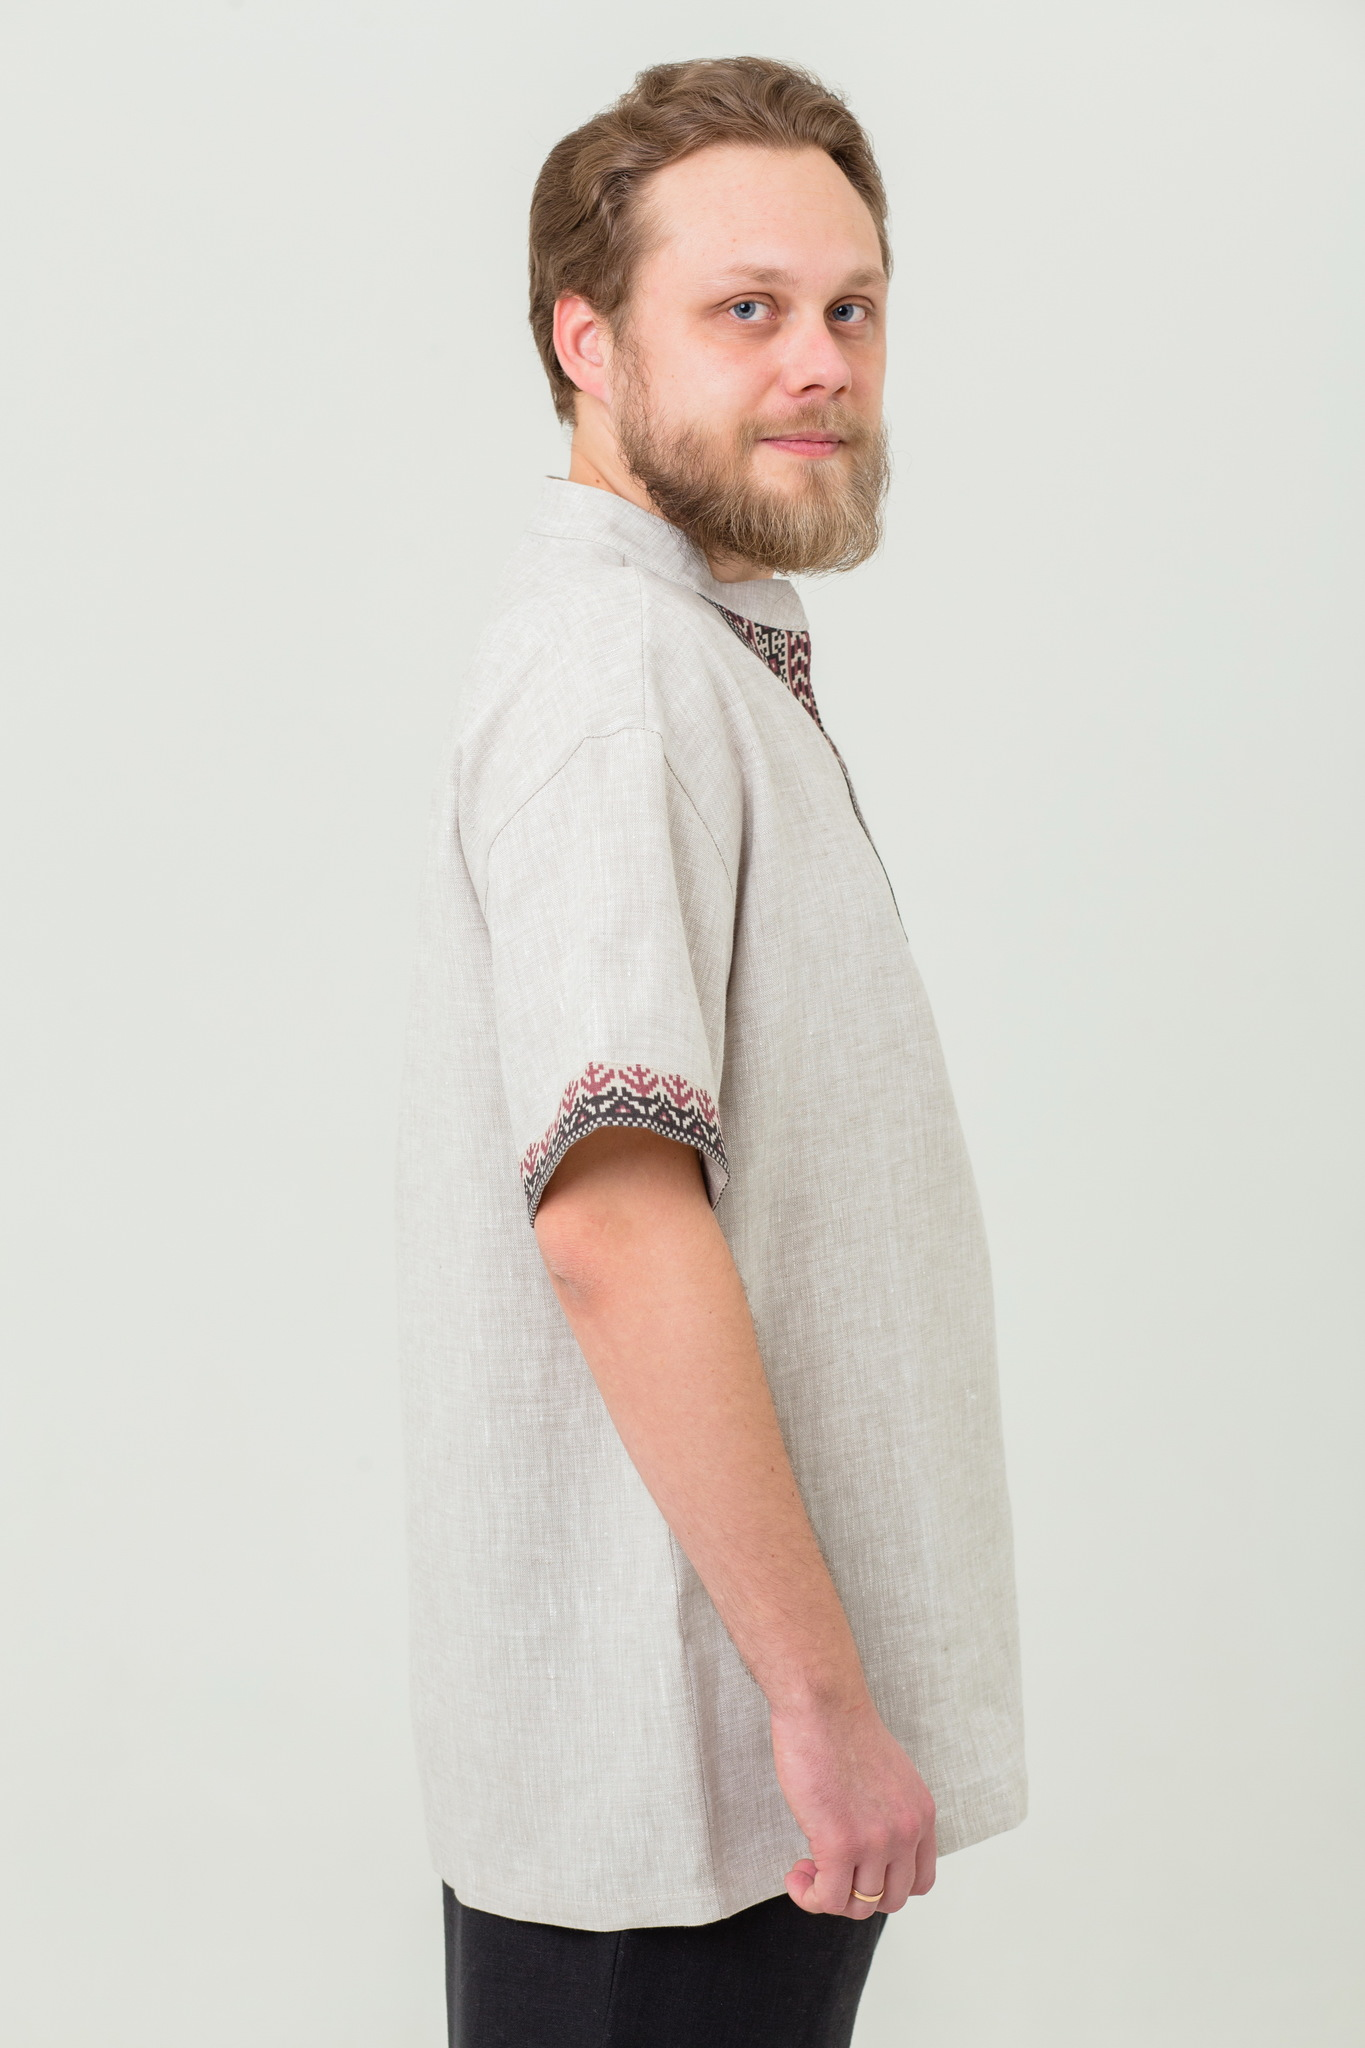 Мужская льняная рубаха Степная в русском стиле